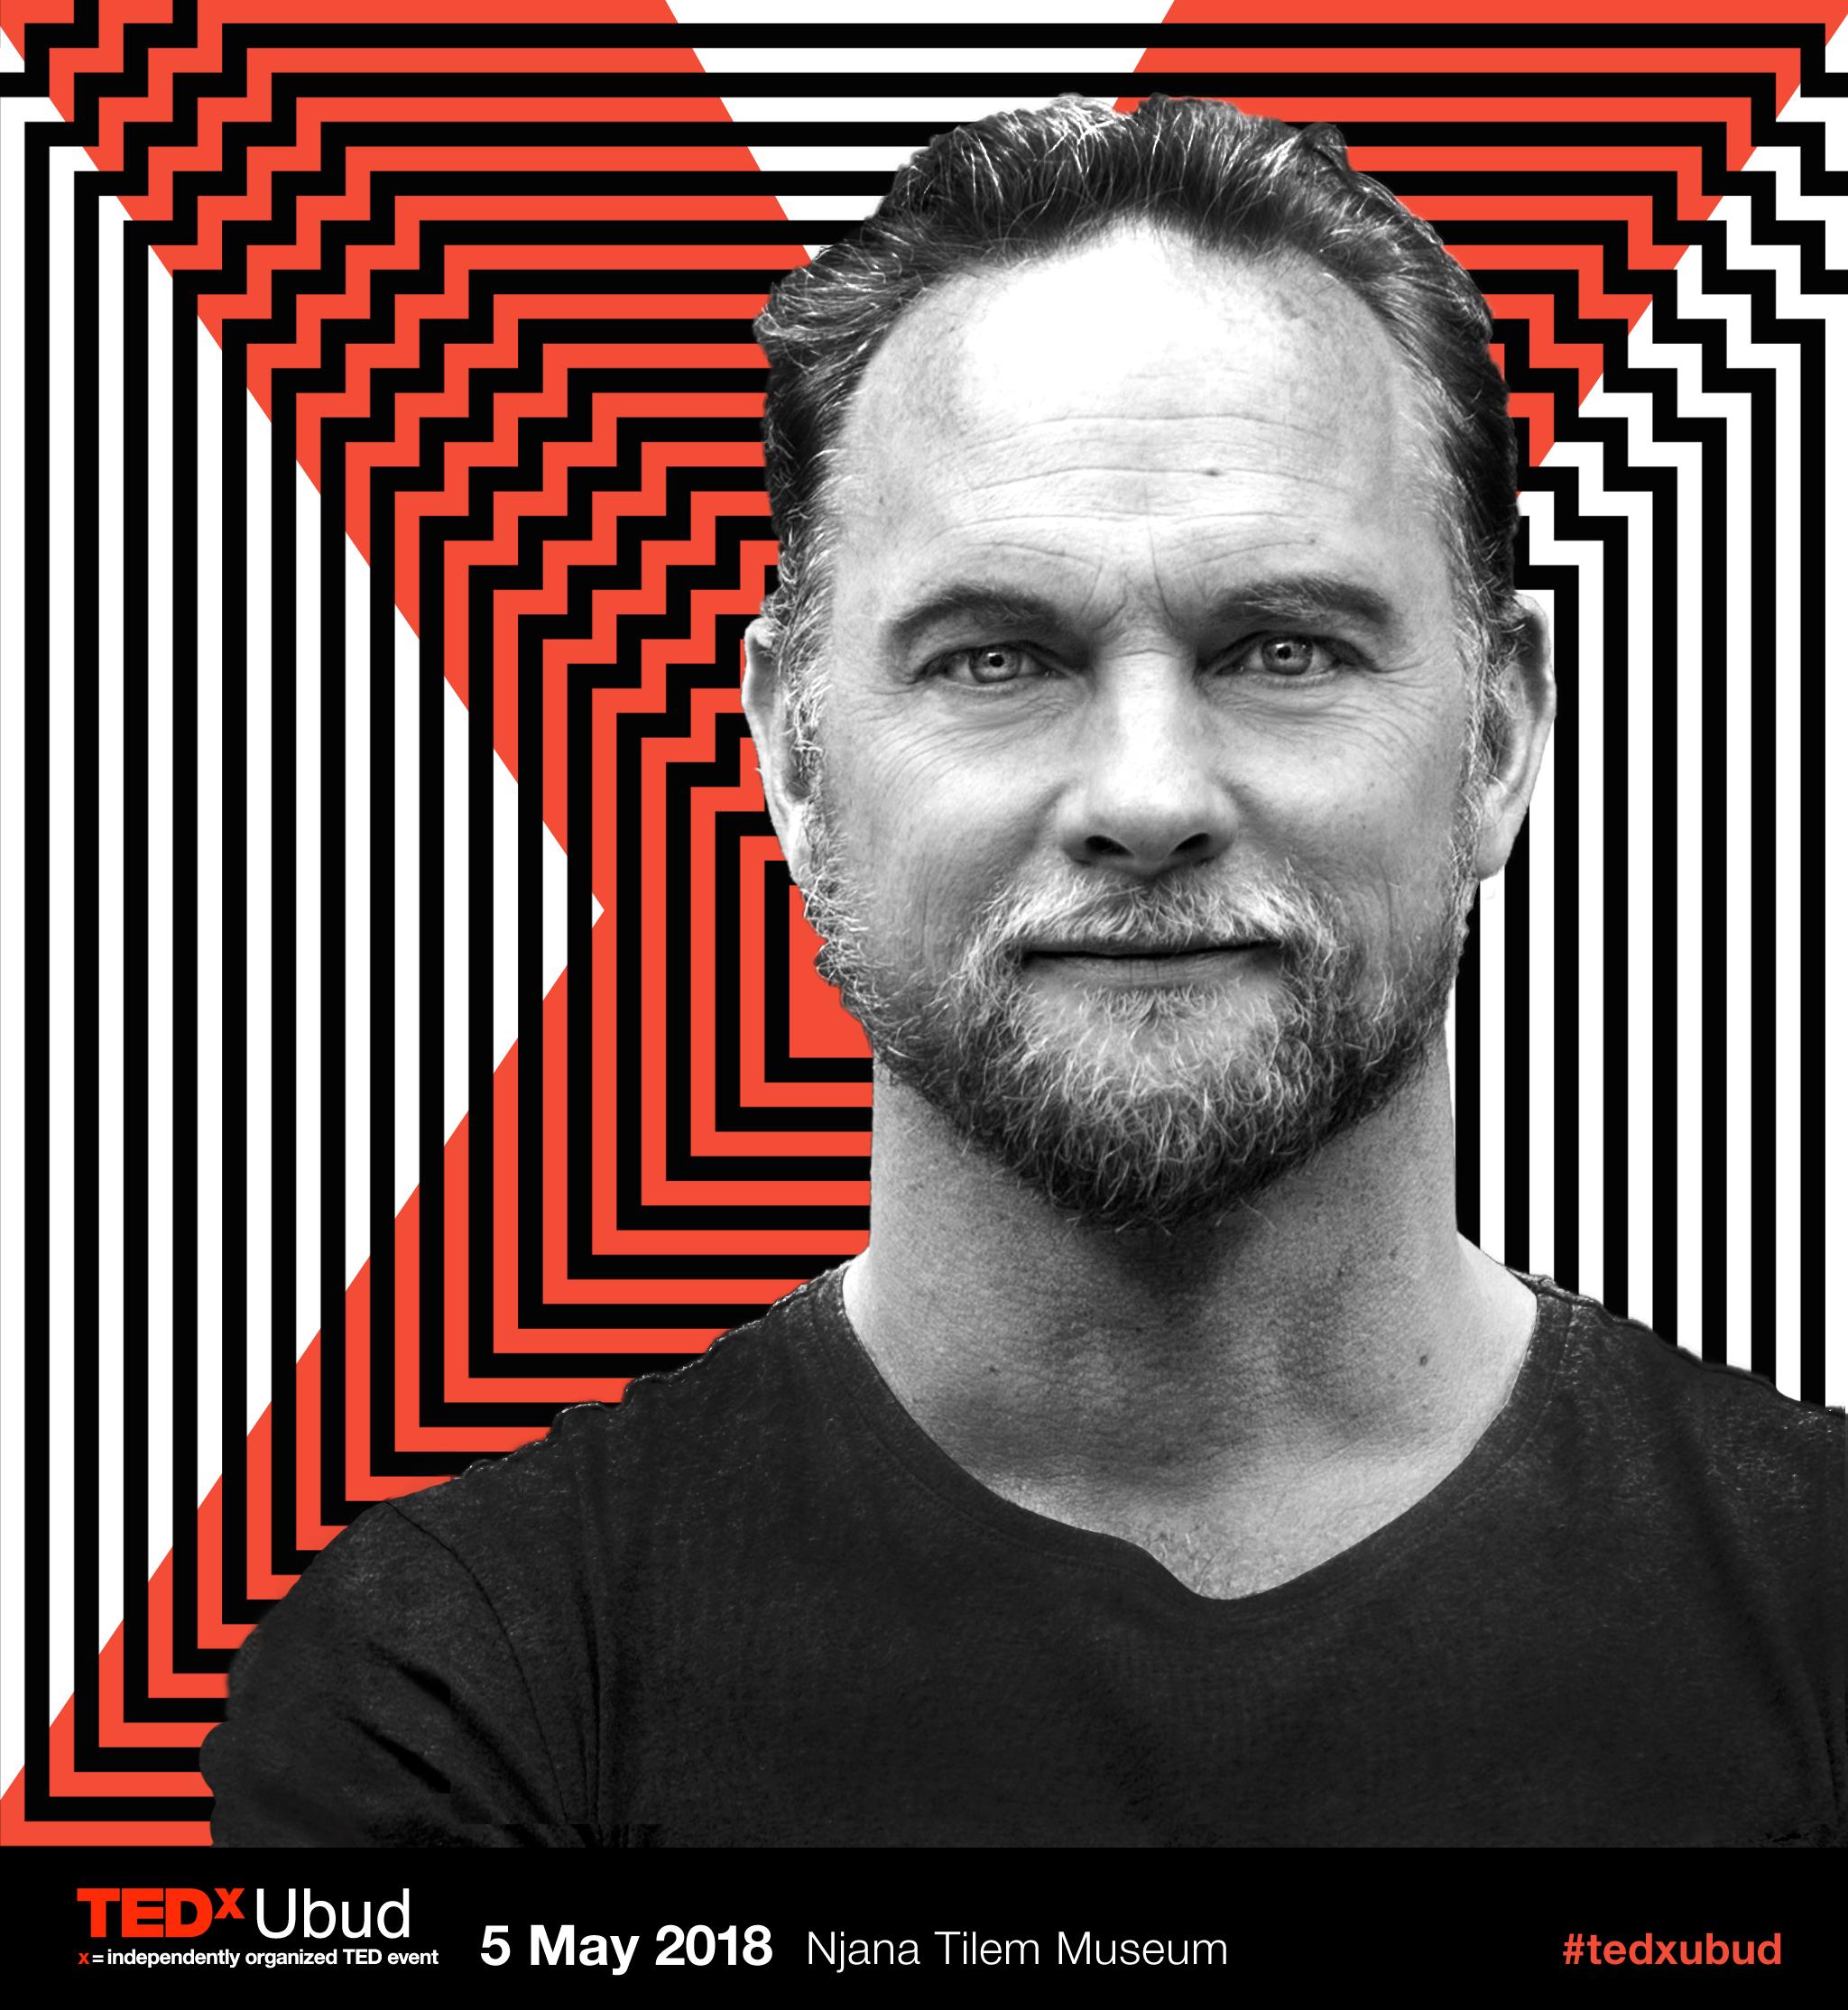 2018-Travis TEDxUbud-FB.png